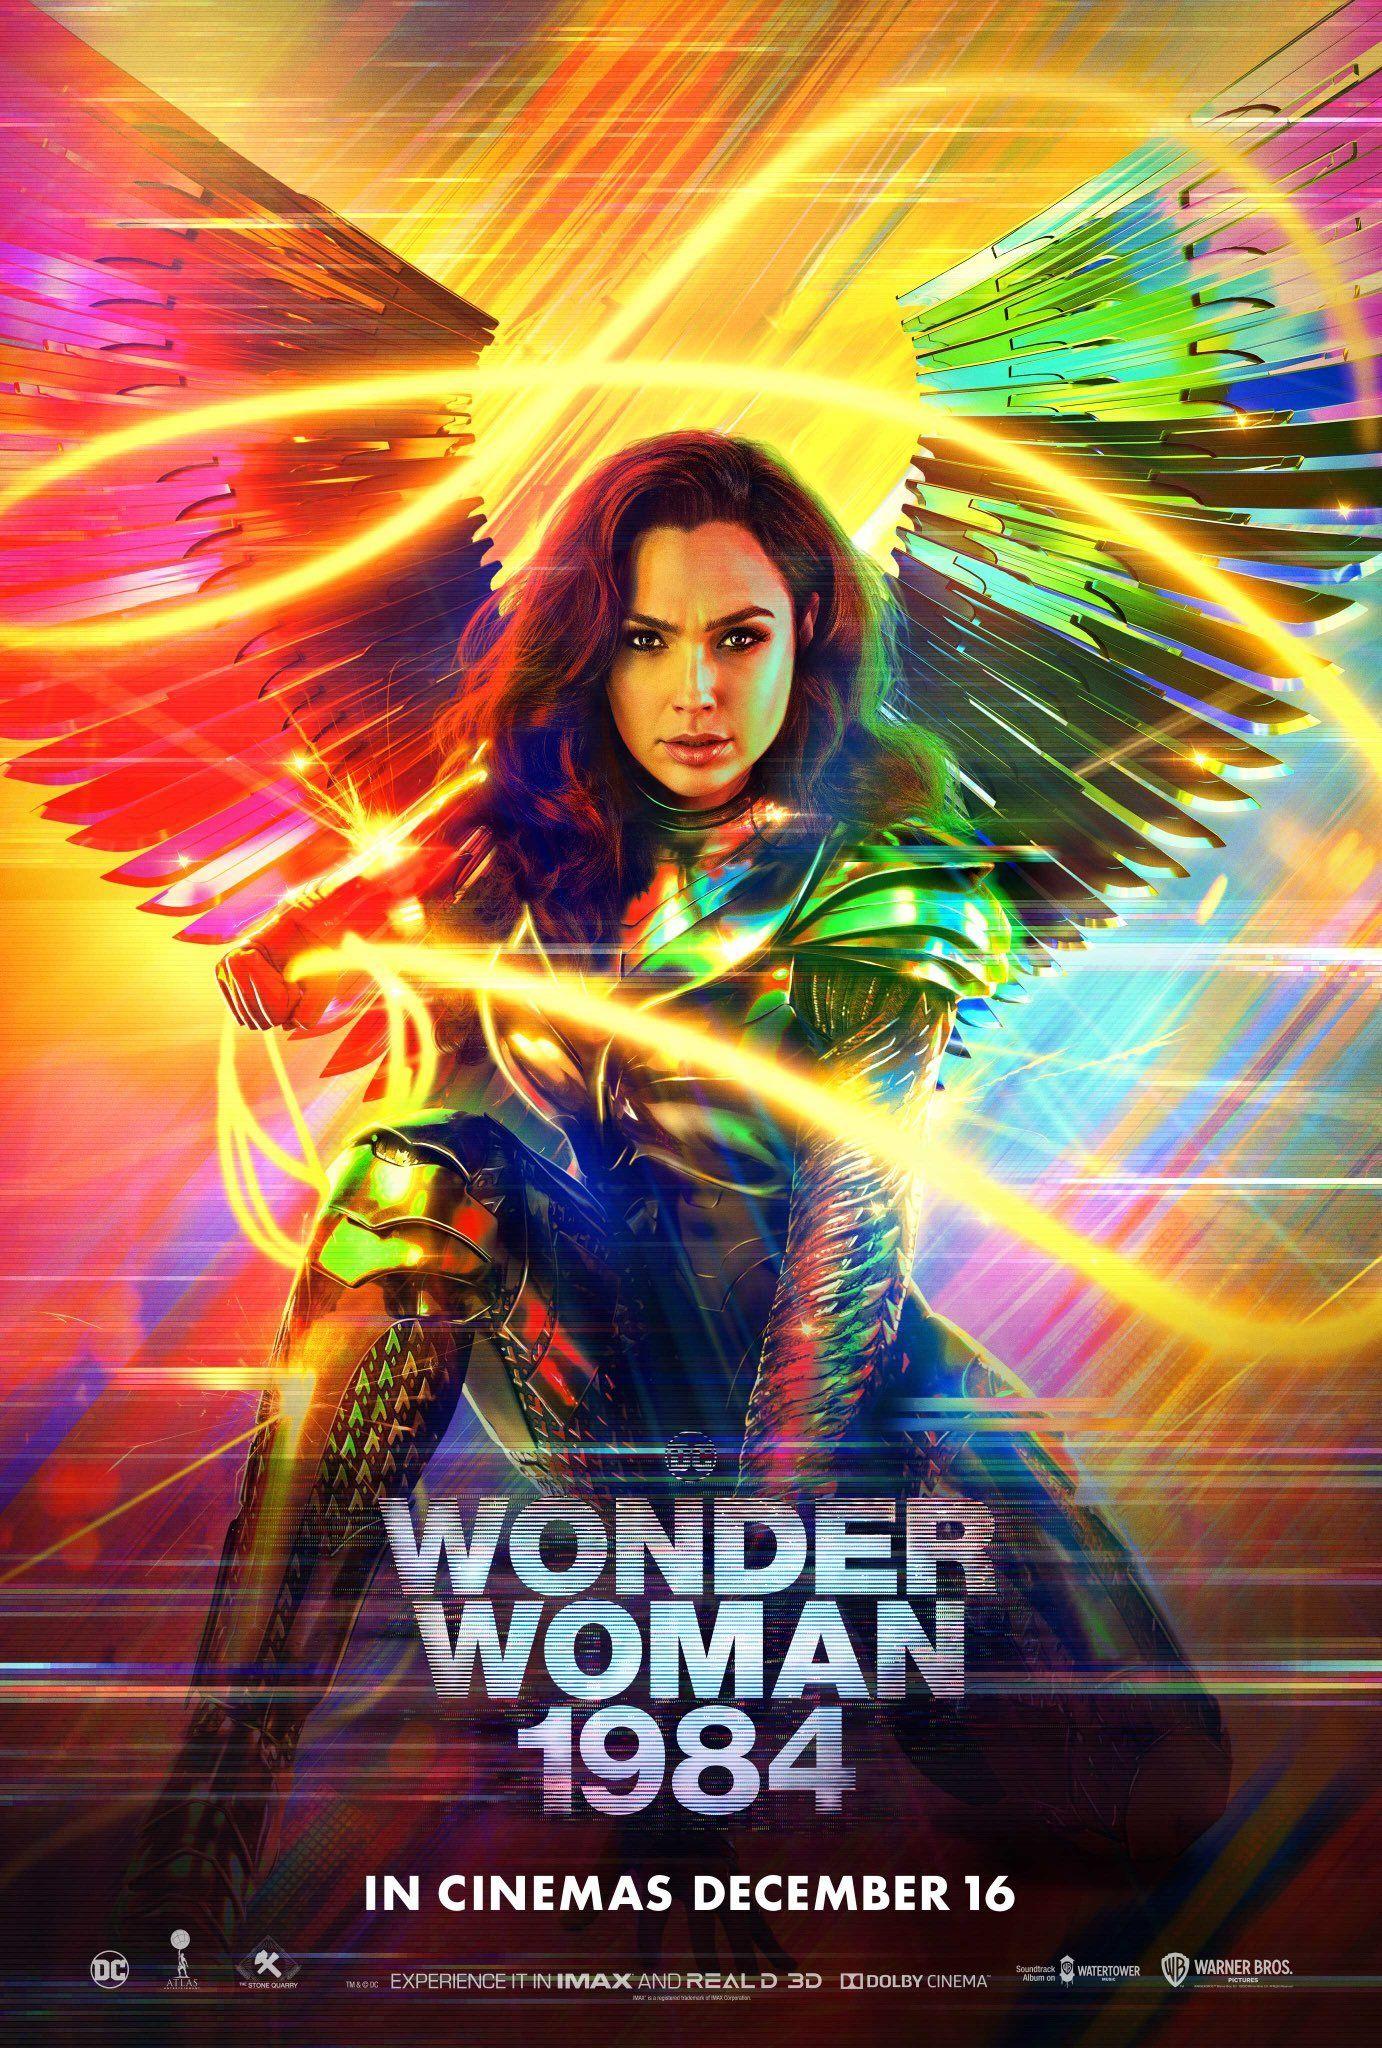 wonder-woman-1984-poster-1606931235.jpg